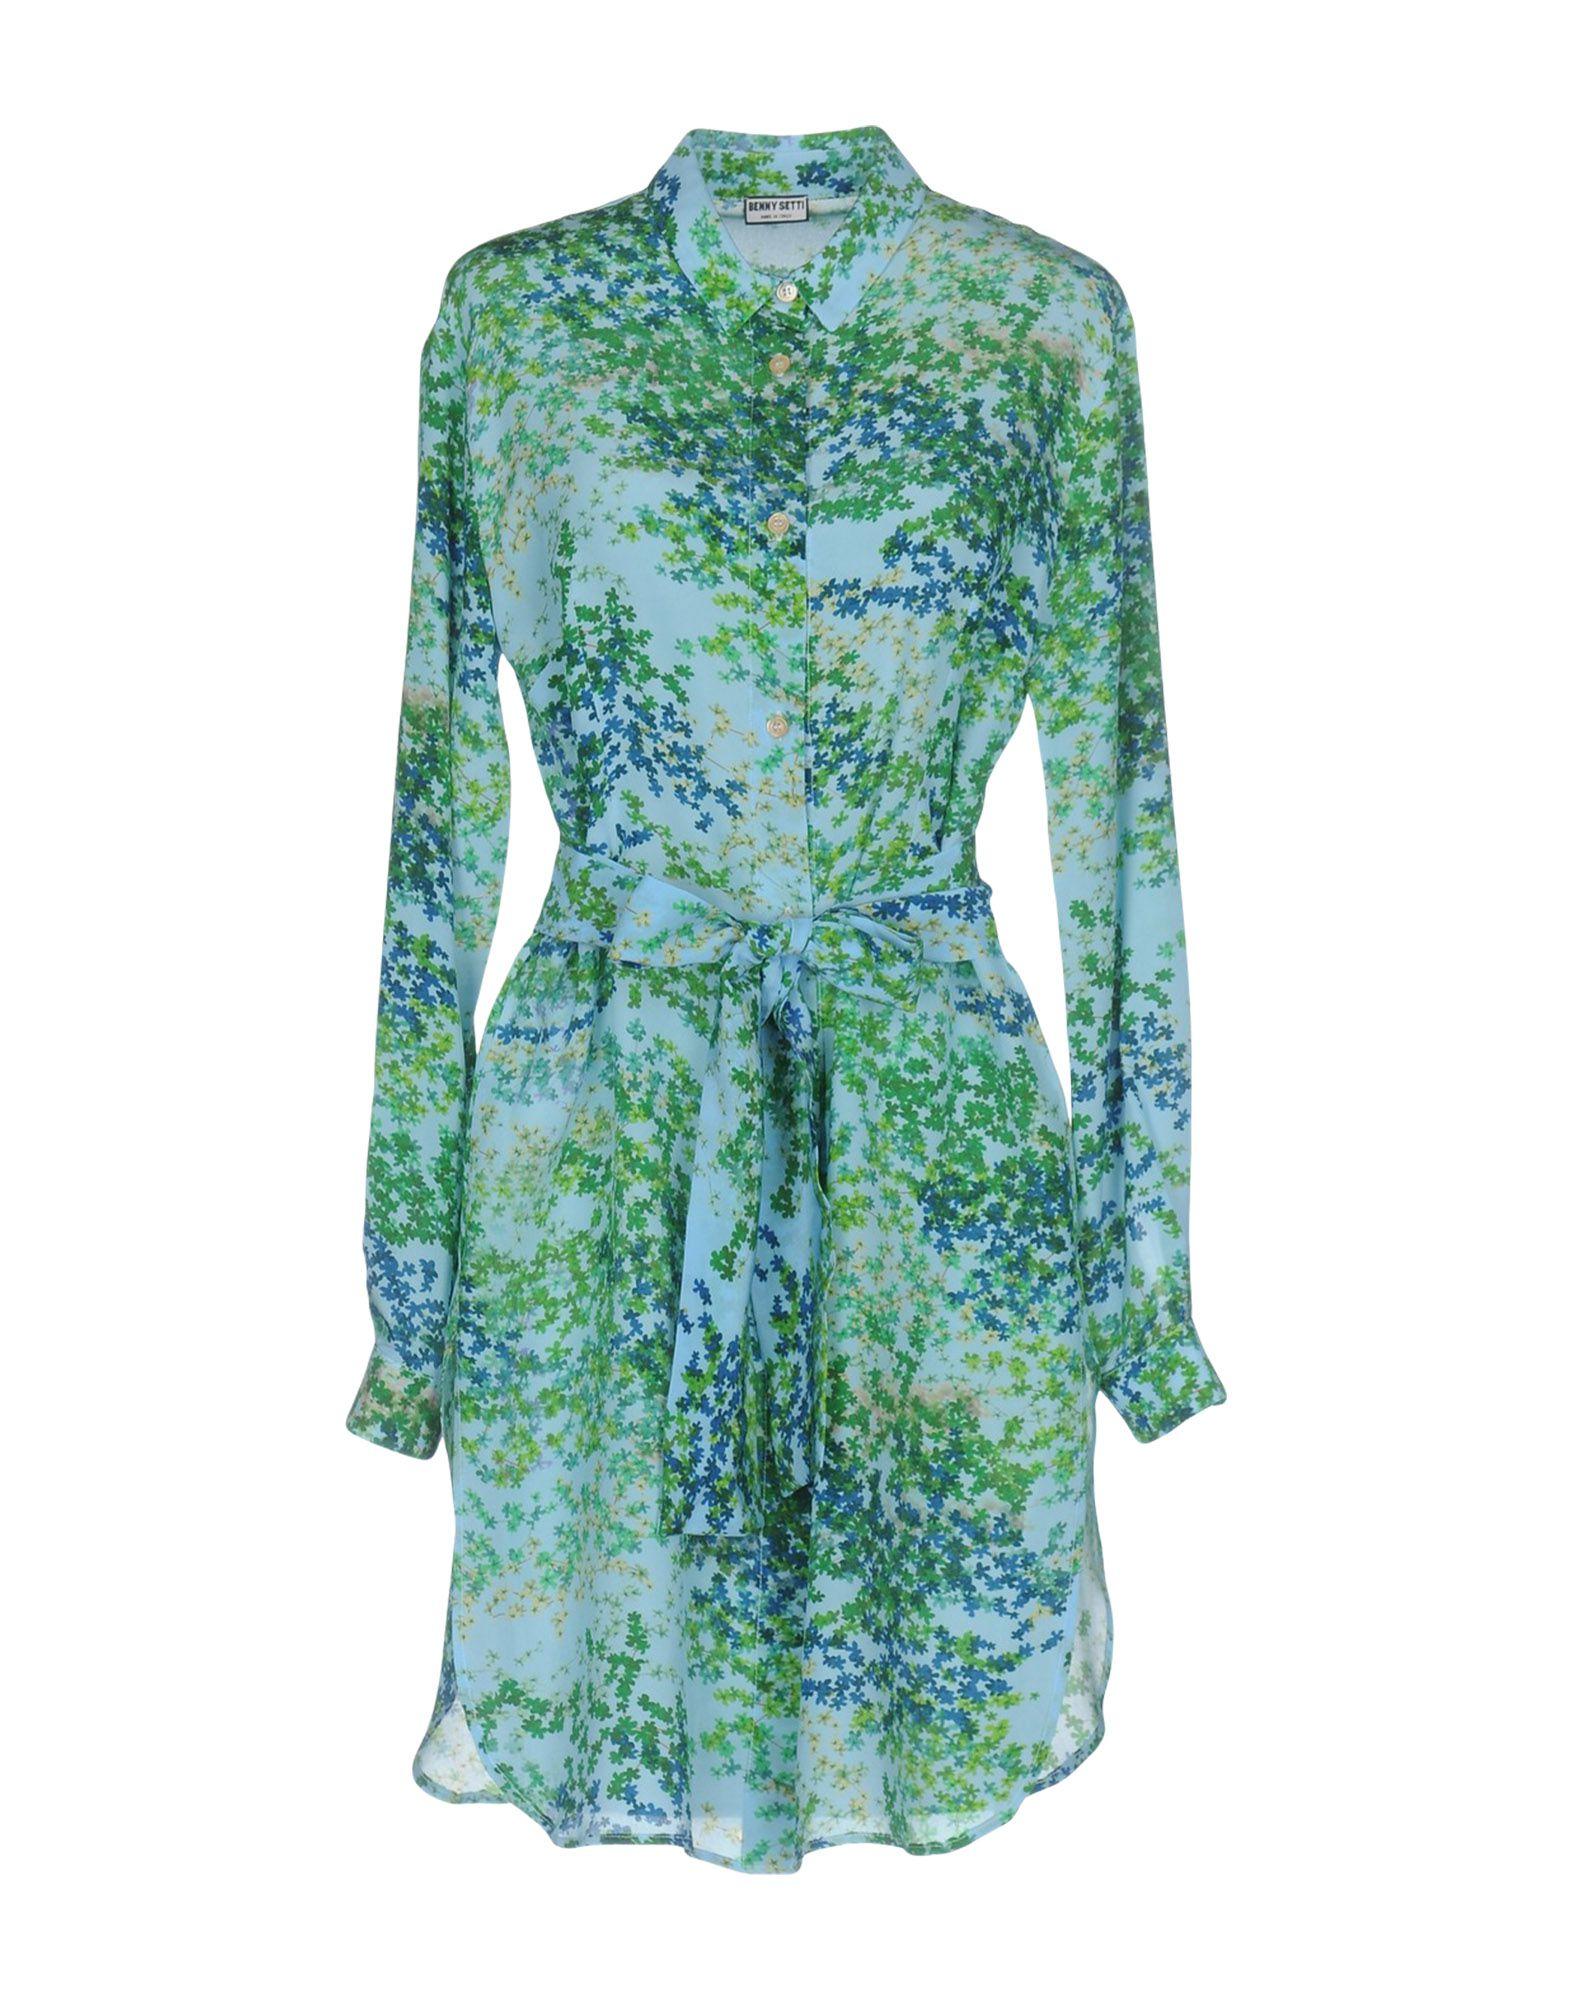 BENNY SETTI Платье длиной 3/4 abba abbabjorn ulvaeus benny andersson lycka